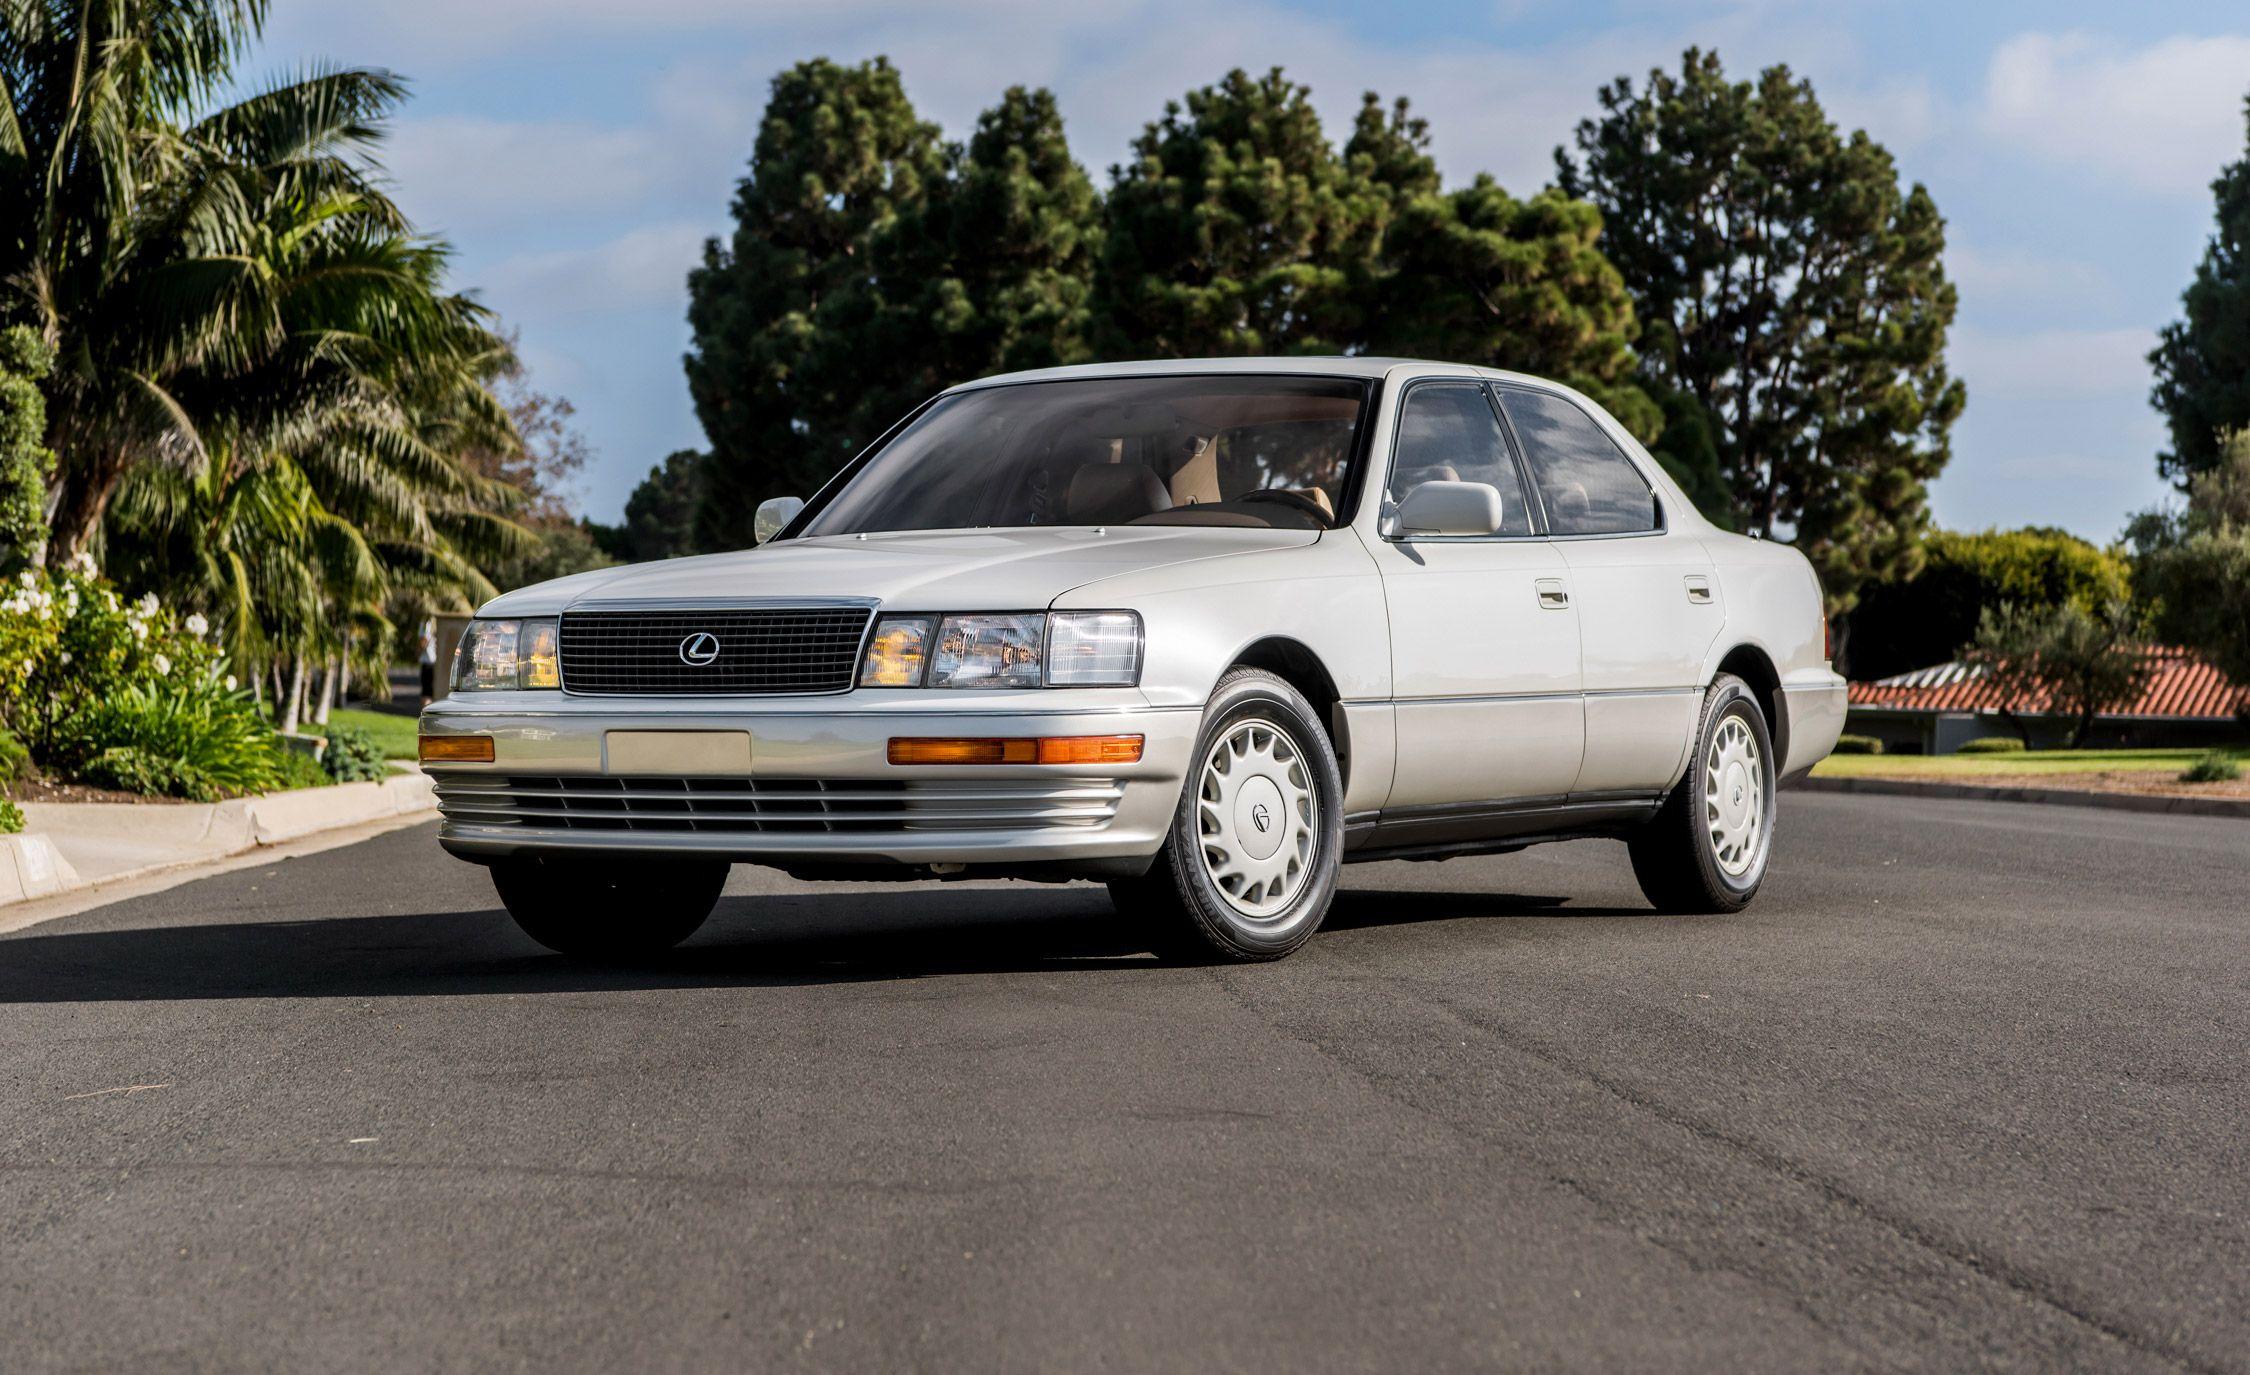 Luxury, Japan-Style: Revisiting the Original Lexus LS400